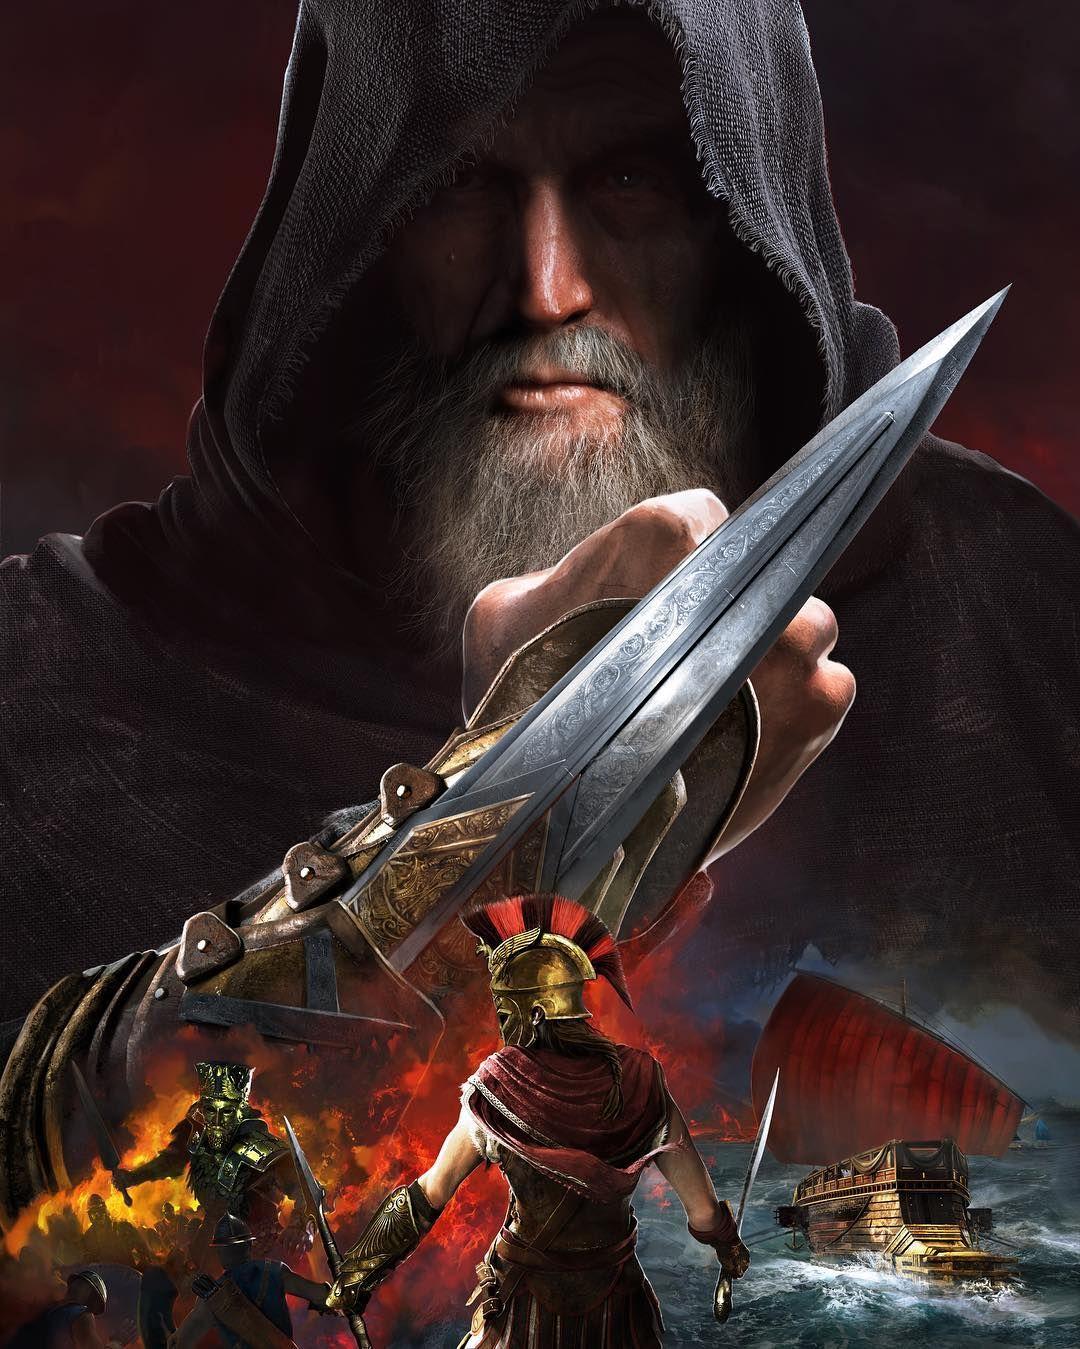 The #AssassinsCreed Odyssey post launch content (season pass